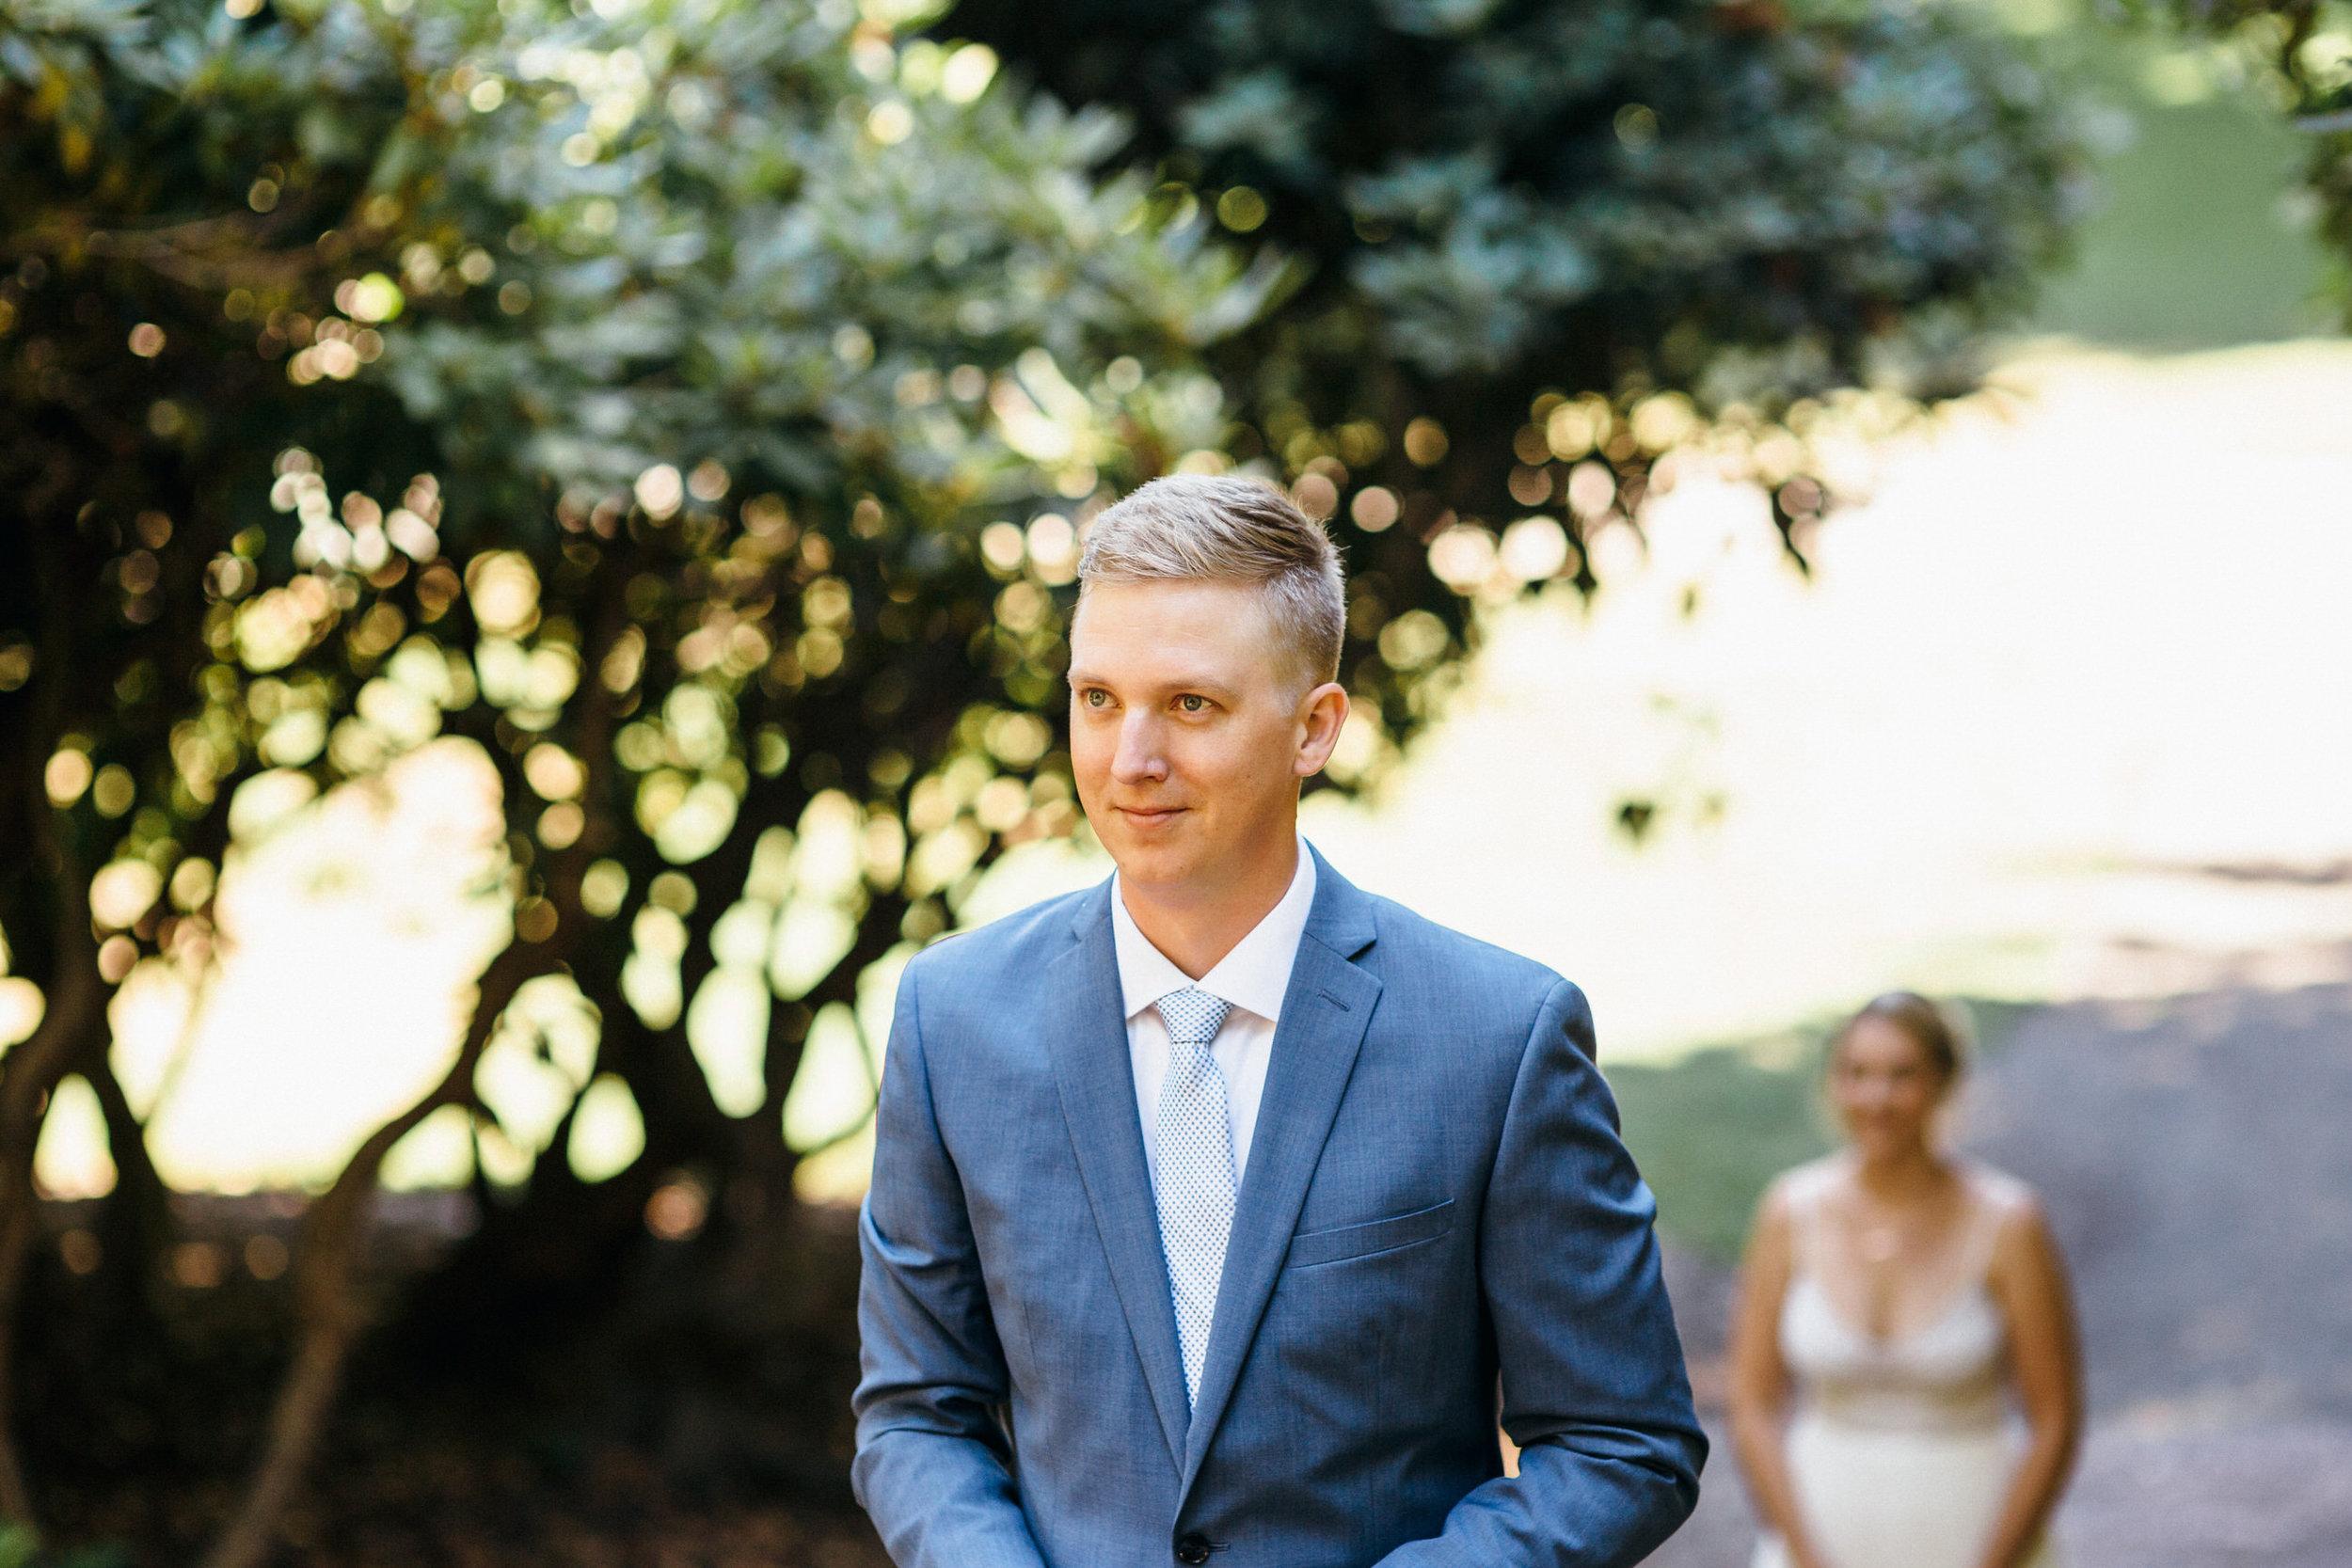 Laurelhurst Park club wedding photographer Portand pdx Oregon024.JPG